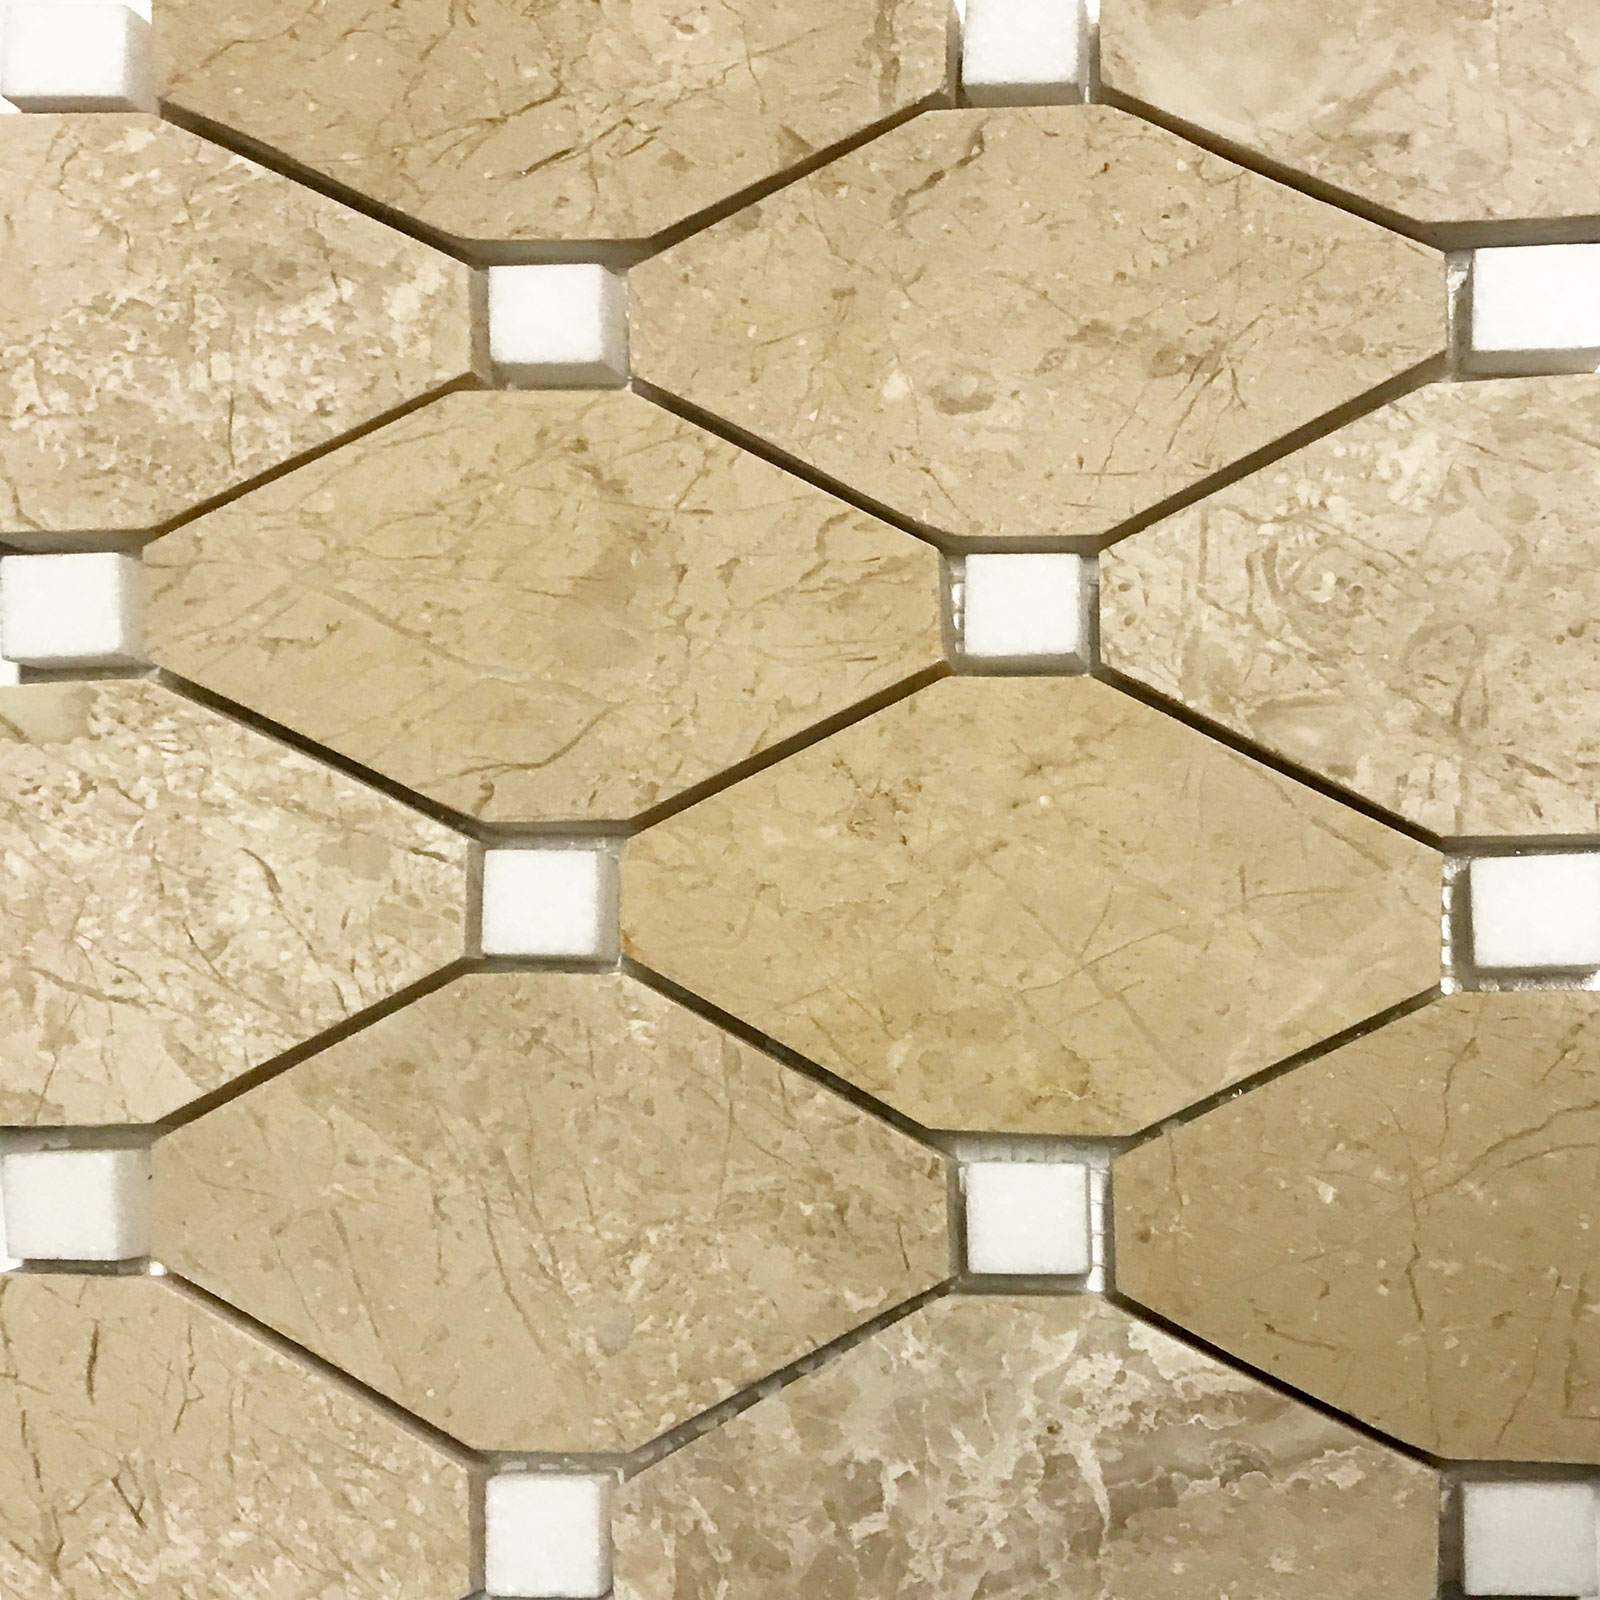 Boliche Mosaic Tile Beige Marfil Marble White Polished